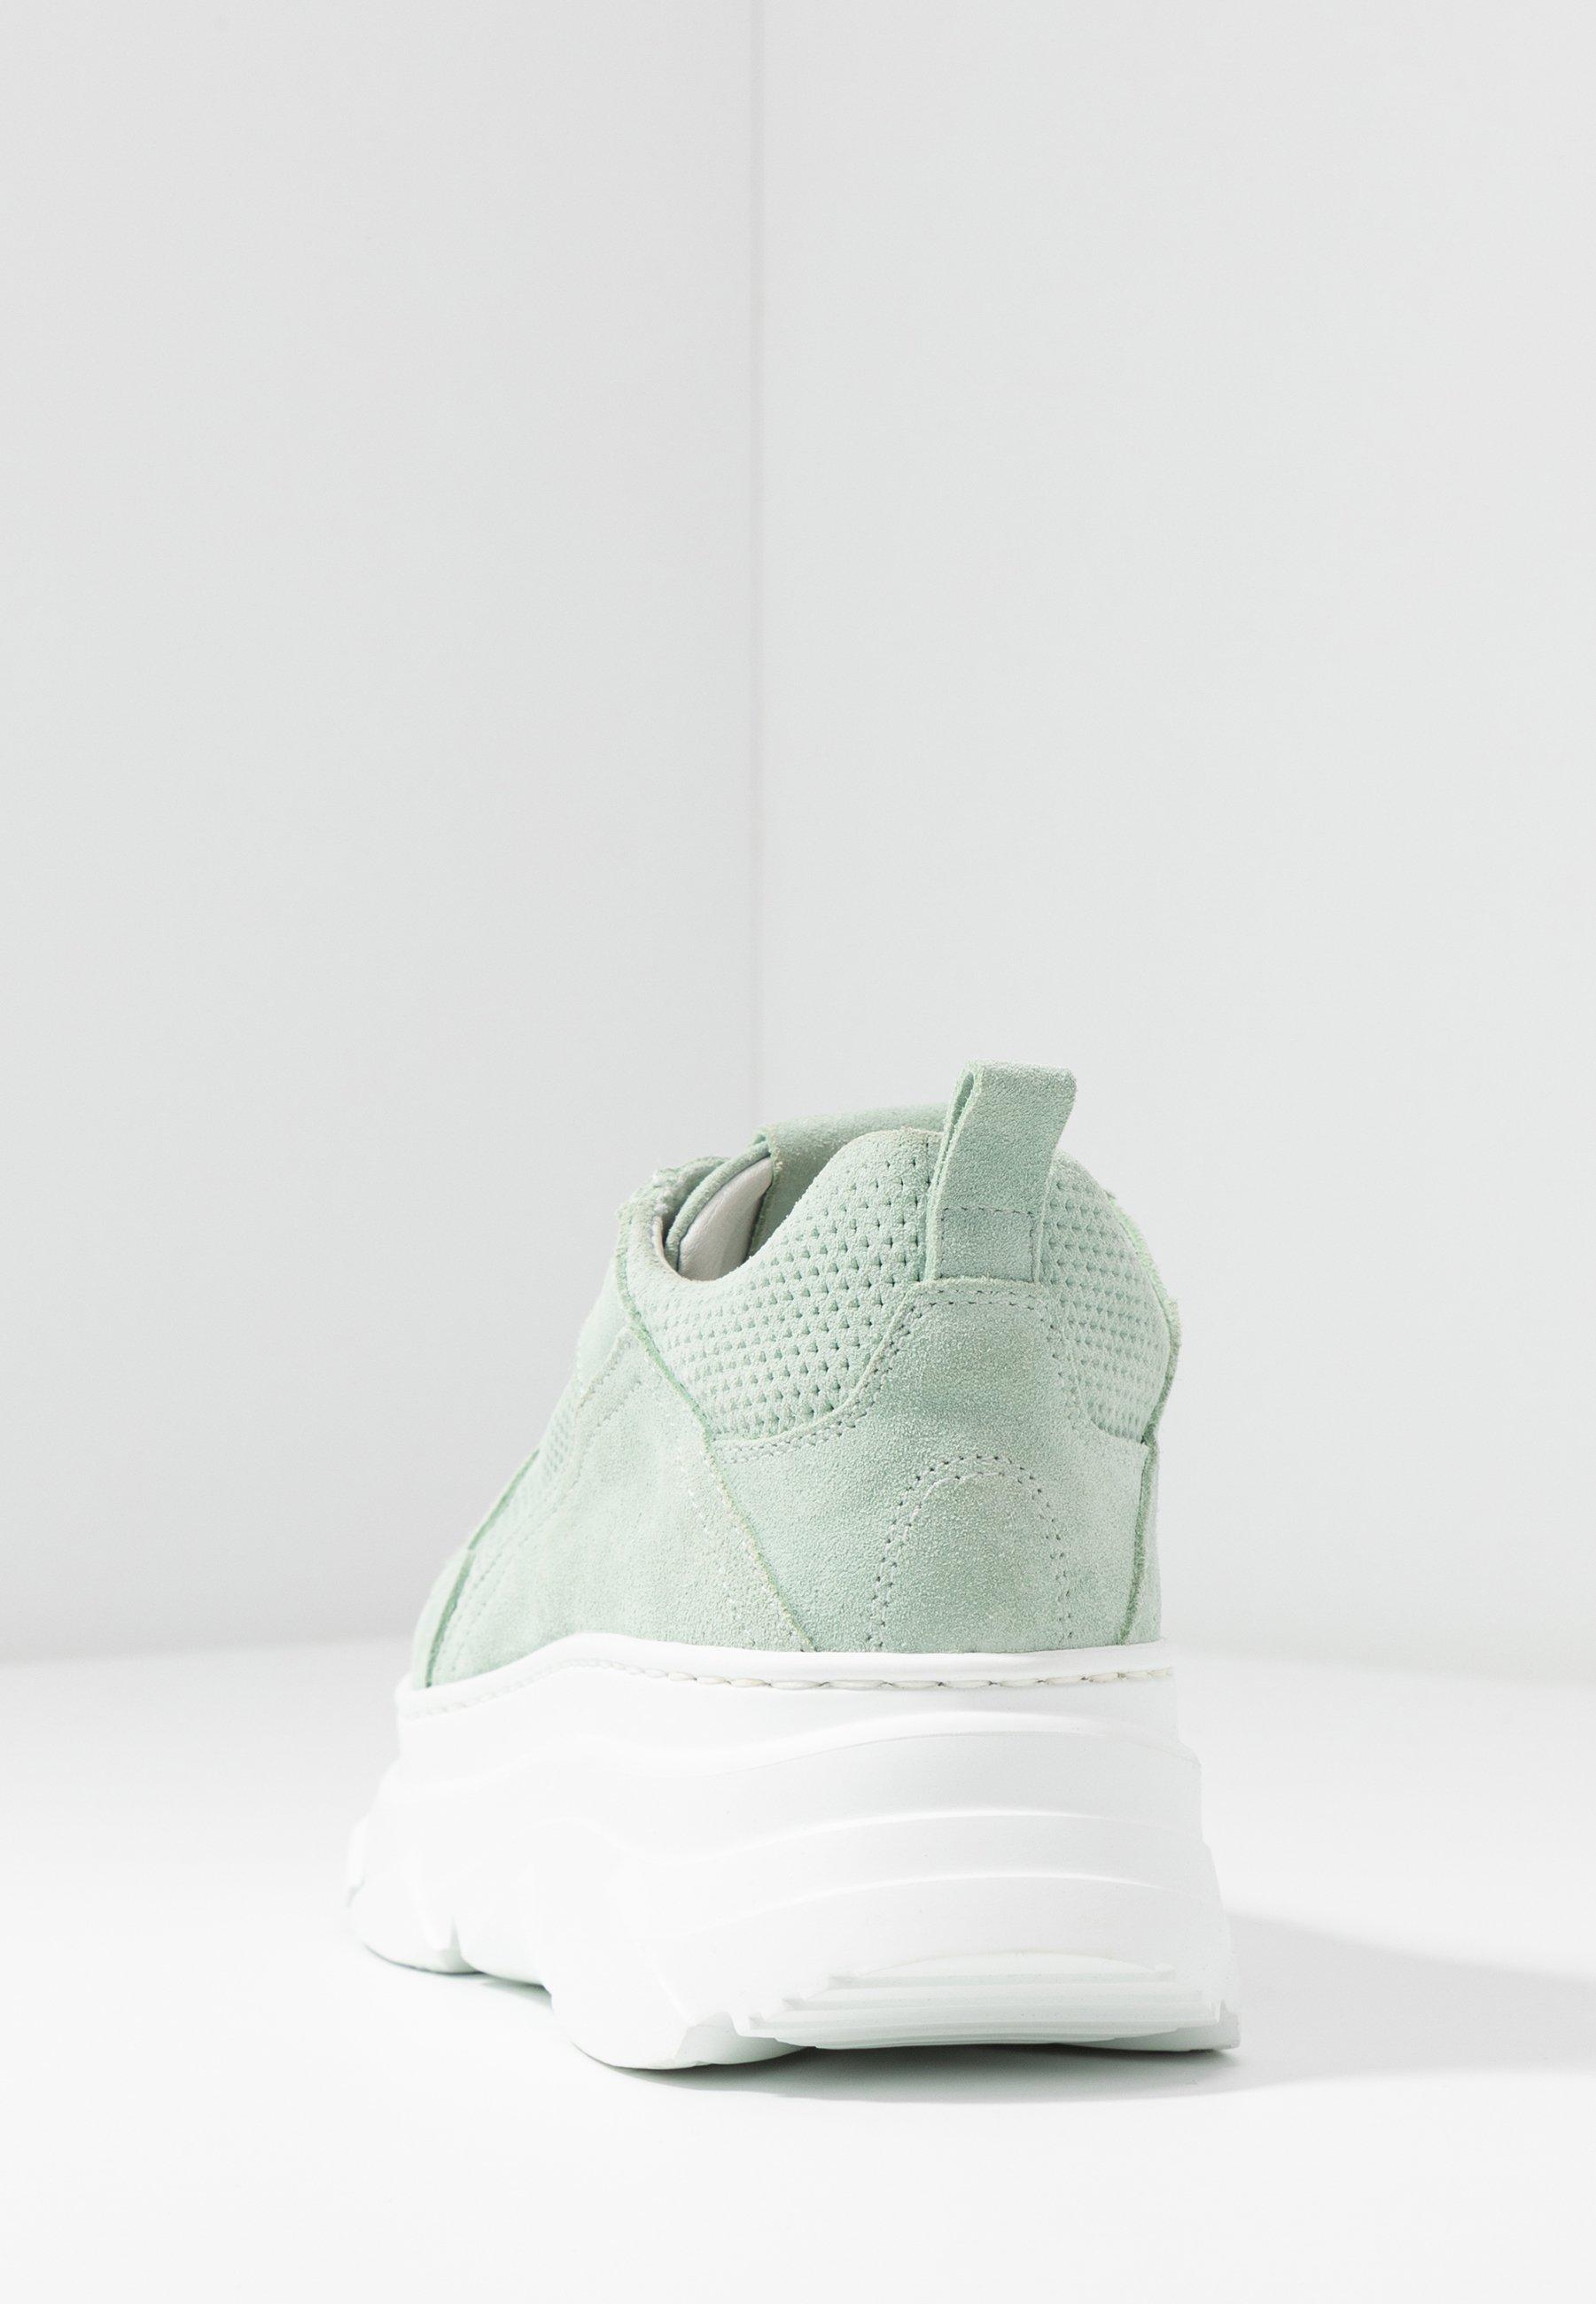 Copenhagen Cph61 - Sneakers Mint